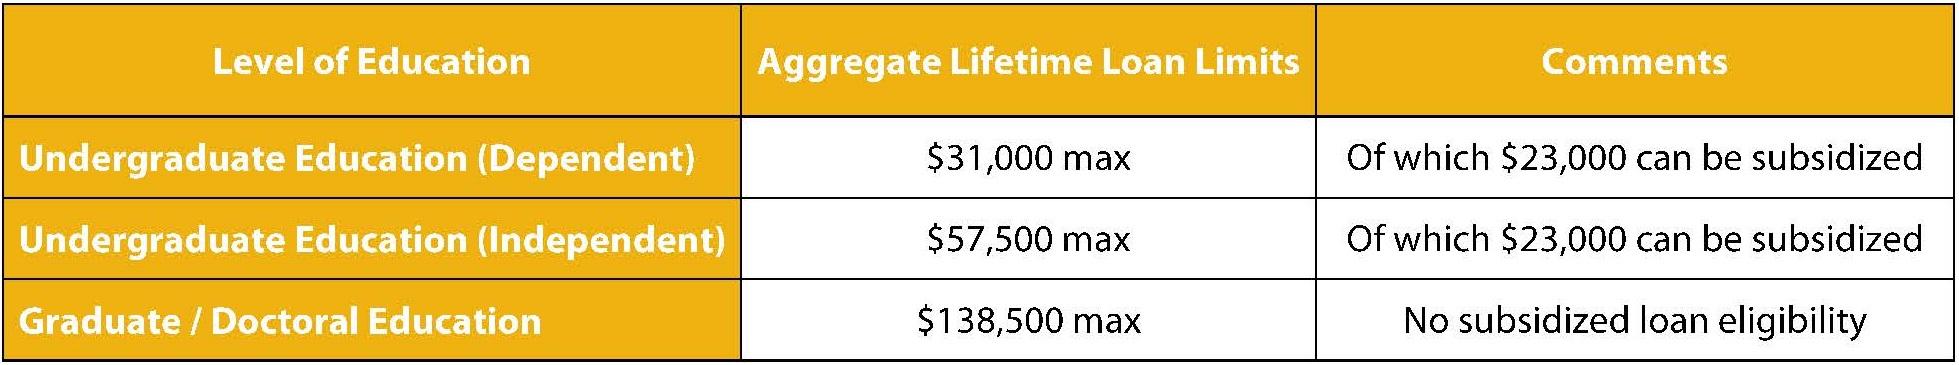 Aggregate Lifetime Loan Limits